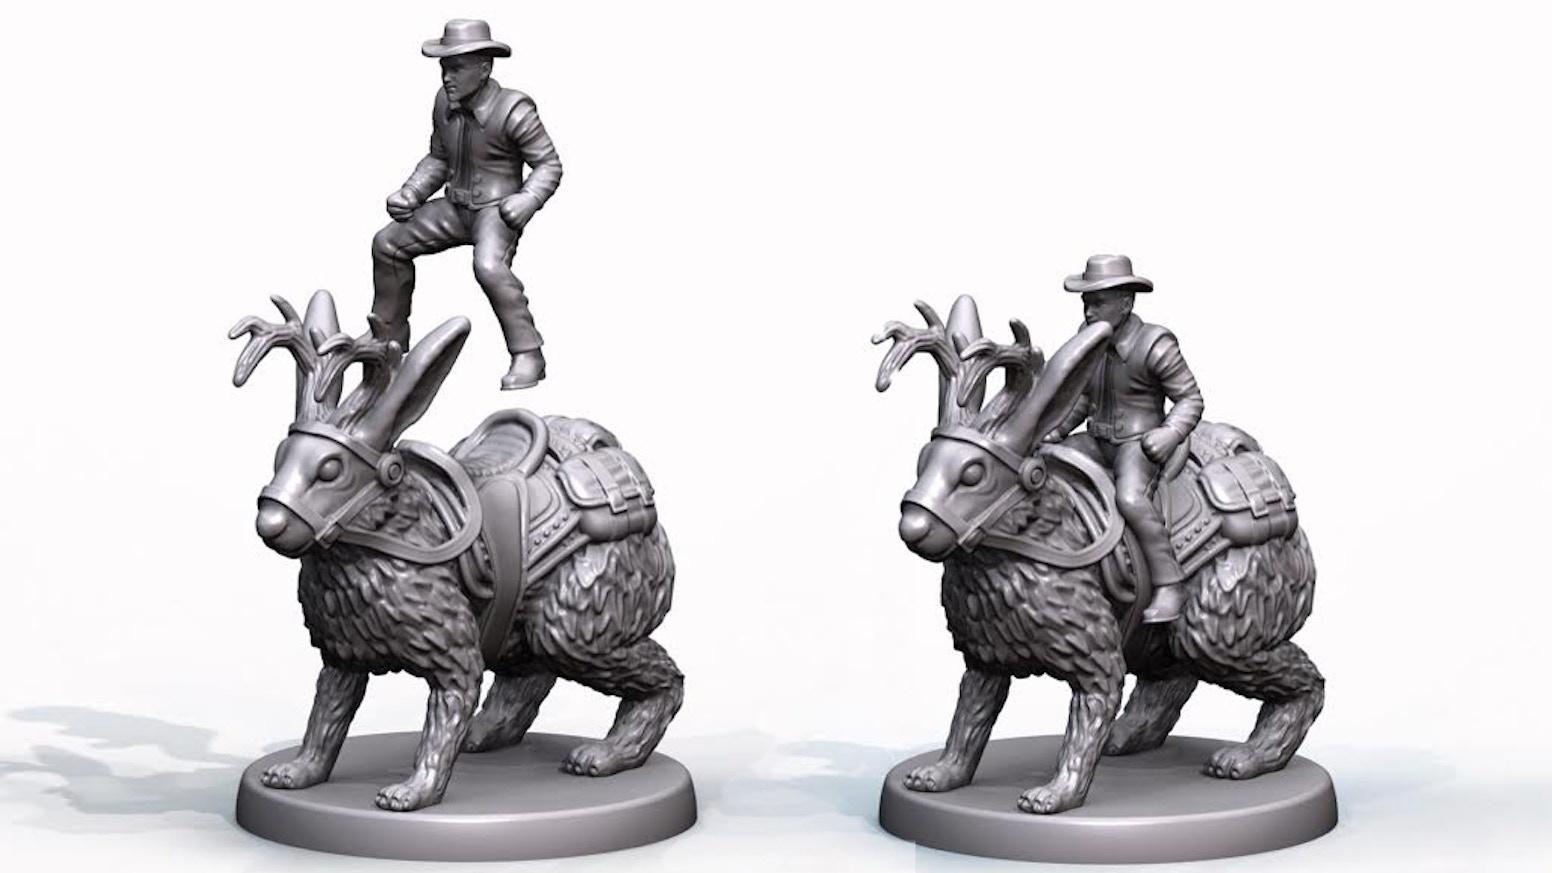 Cowboy Riding a Jackalope PVC Tabletop Gaming Miniature by